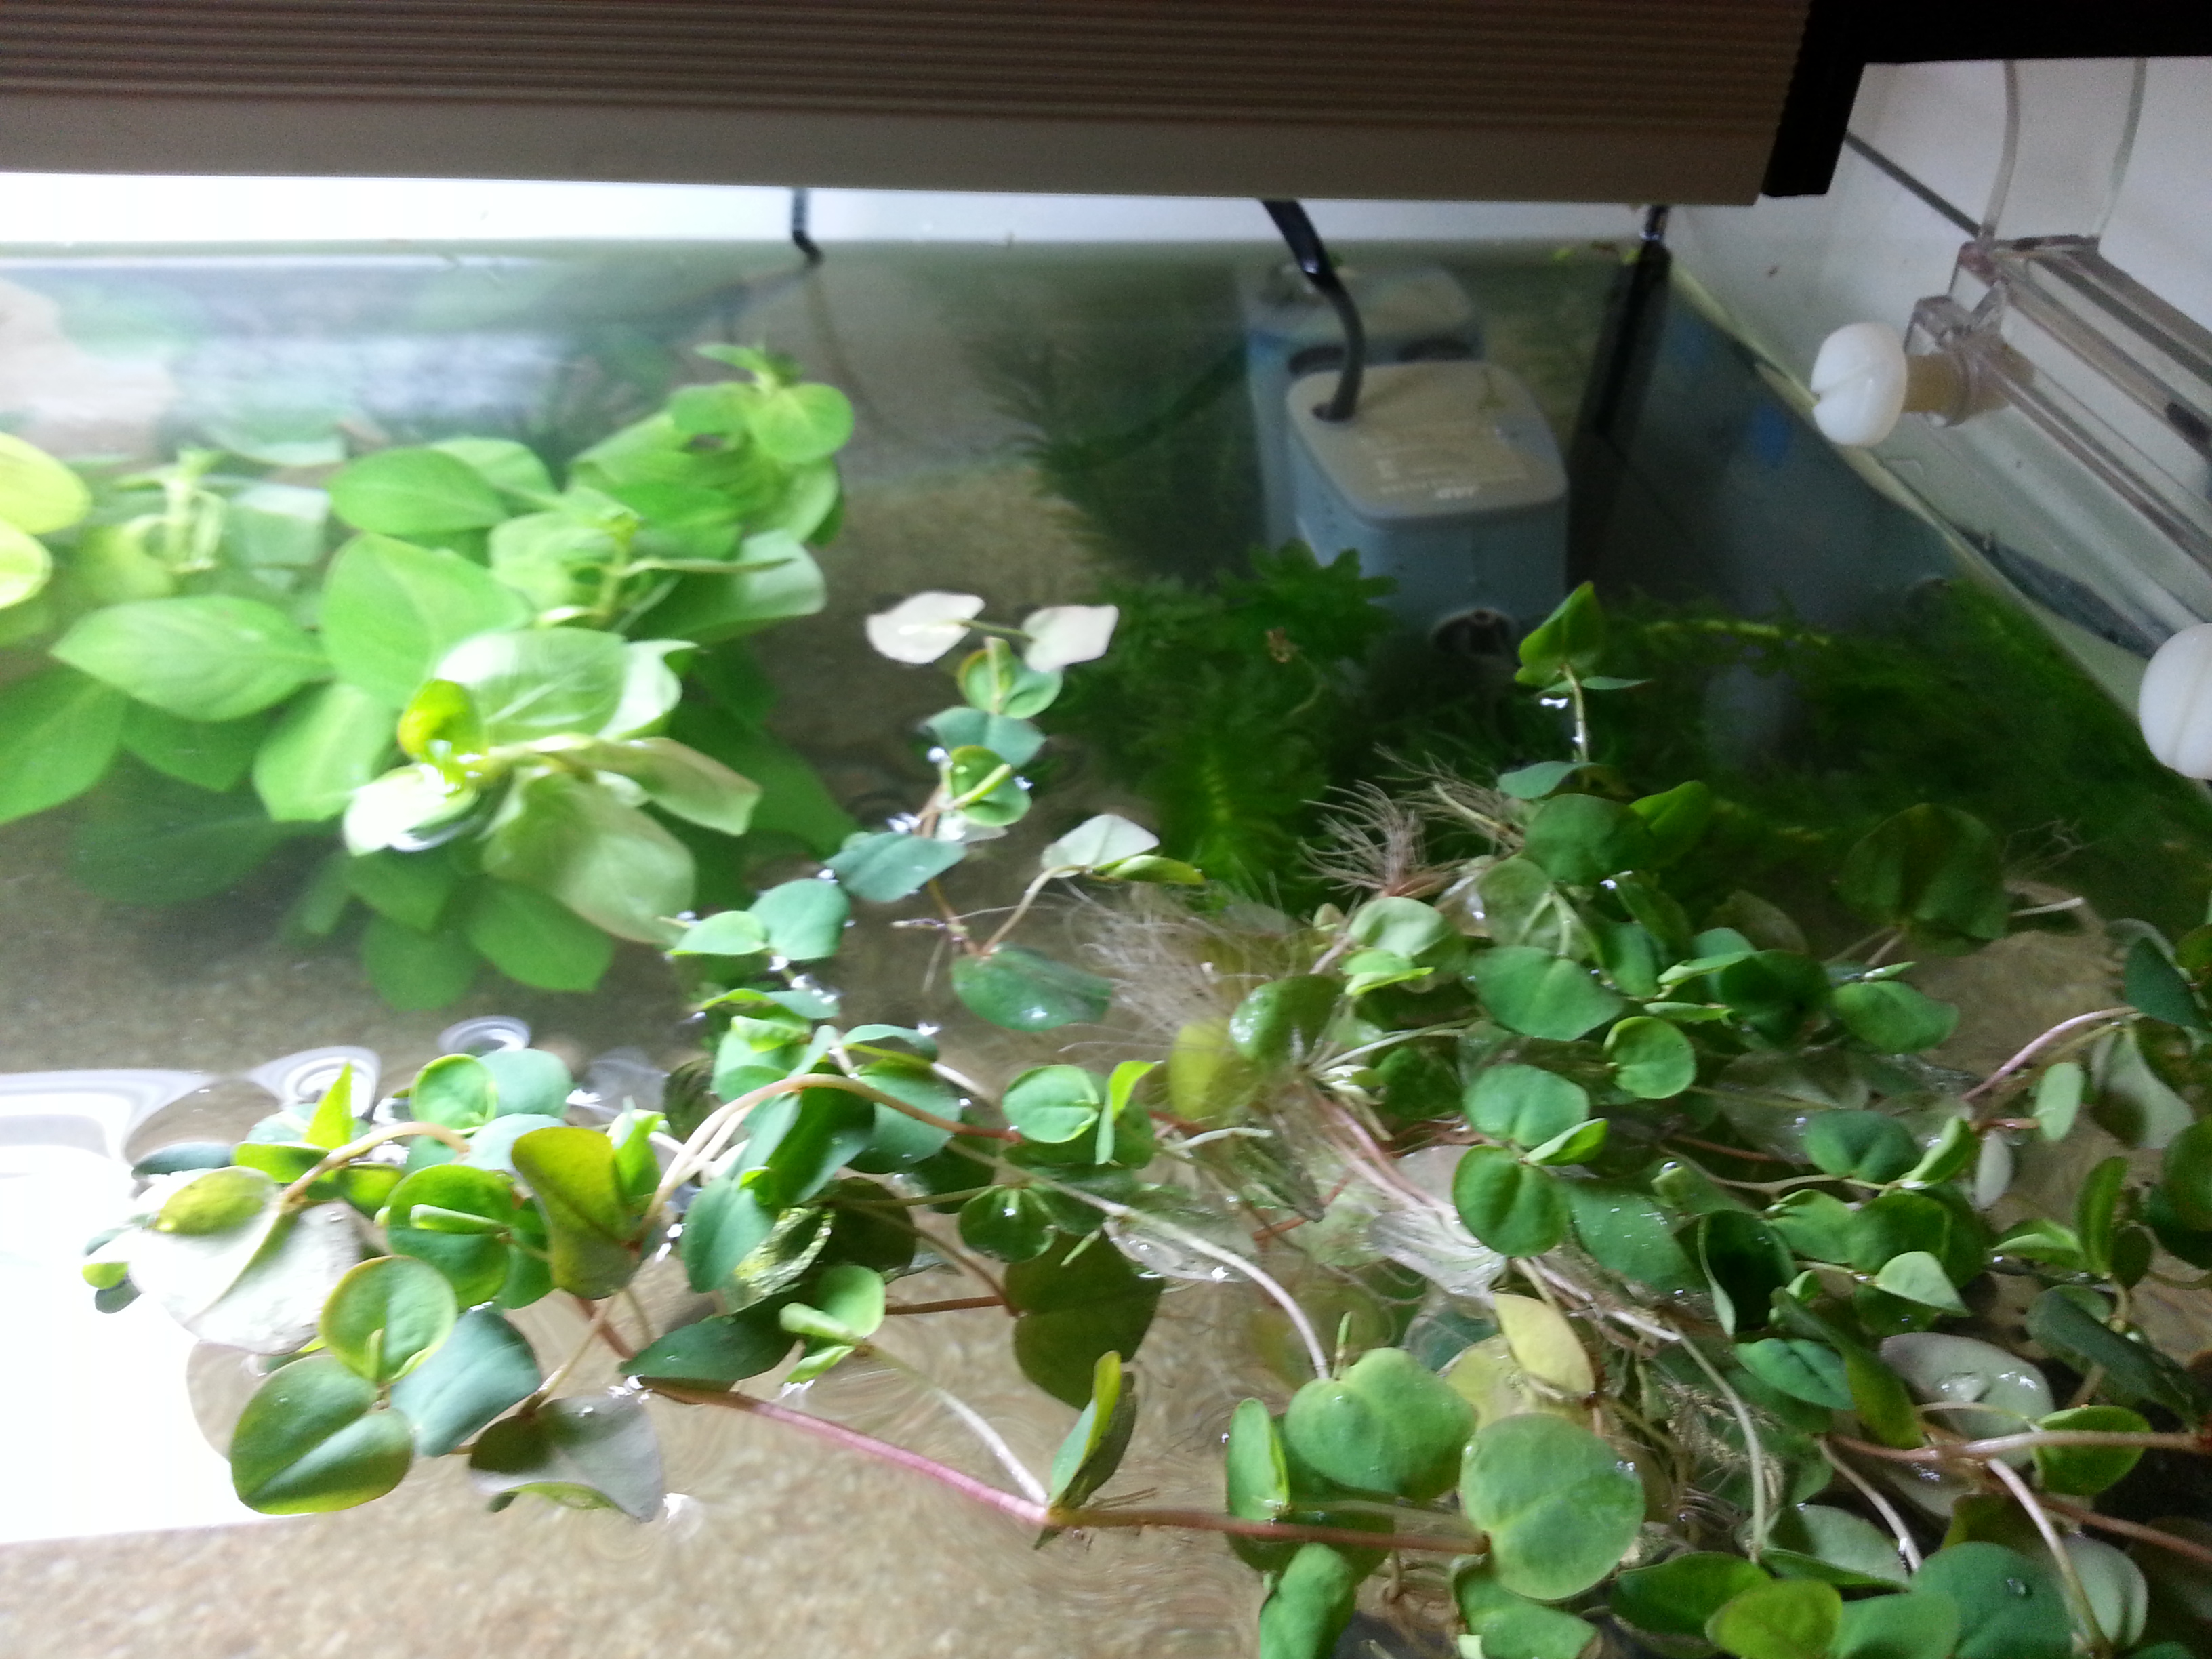 plante dans un aquarium 85002120130613003132